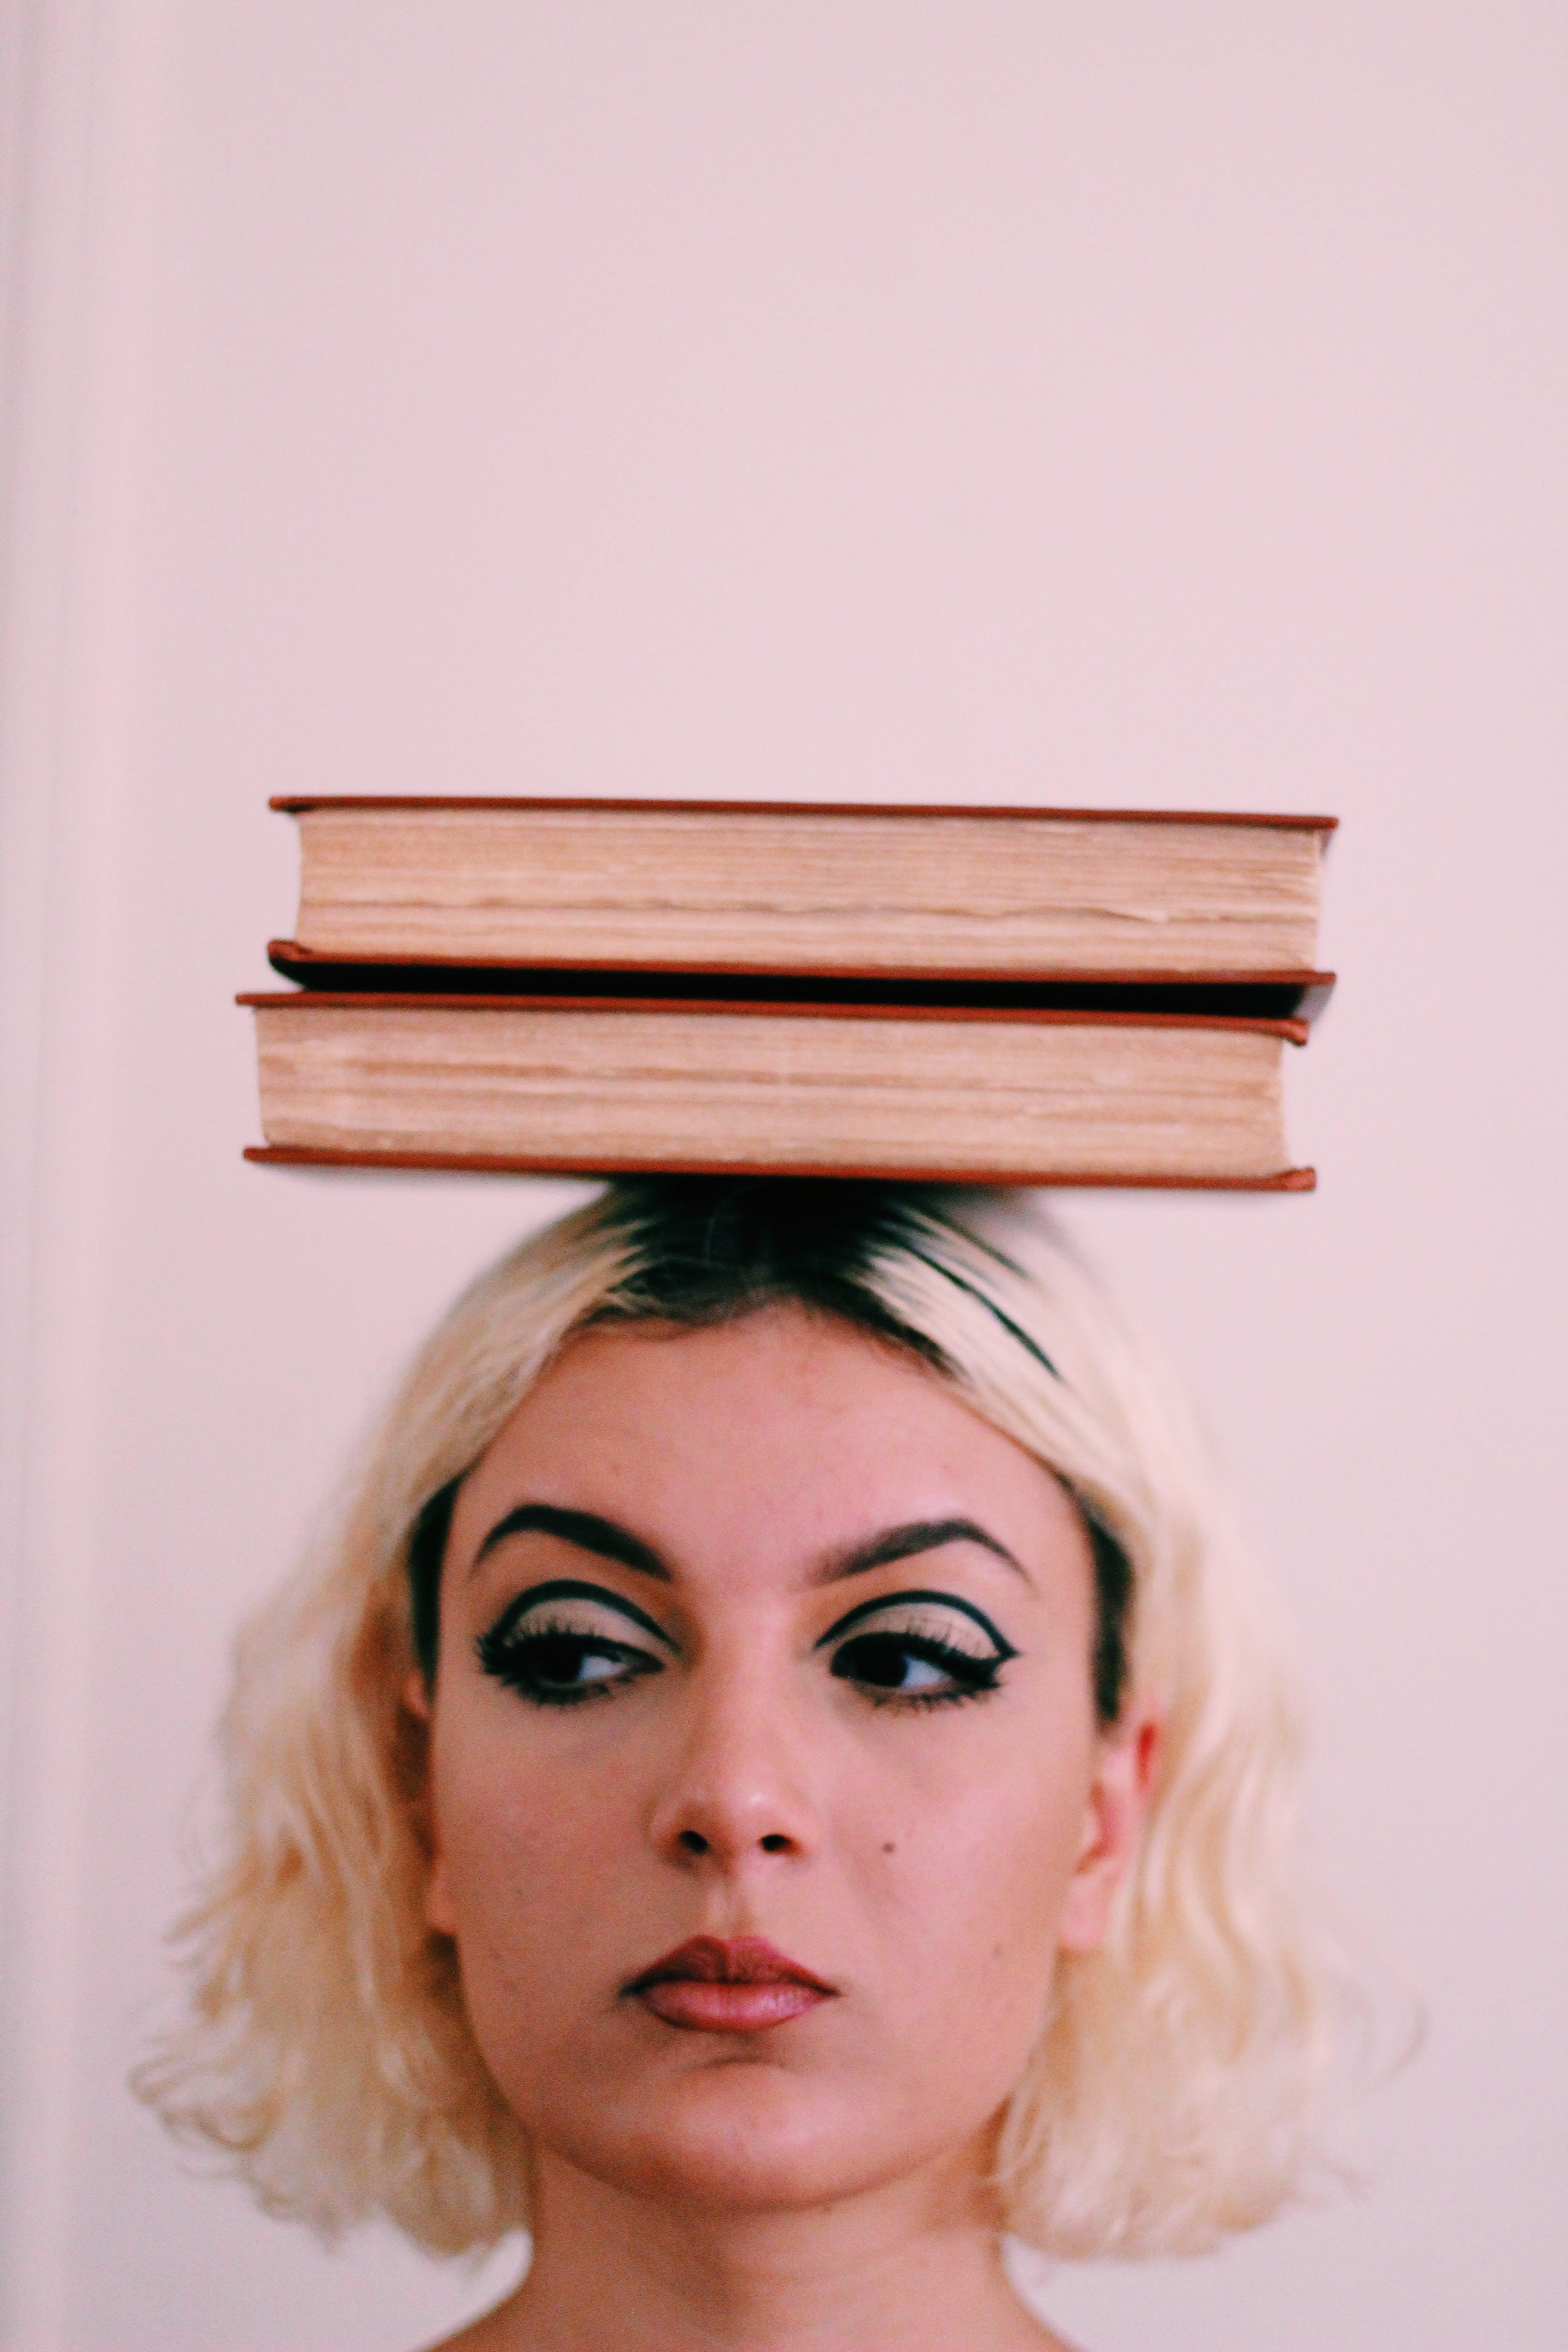 Free stock photo of woman, books, girl, model